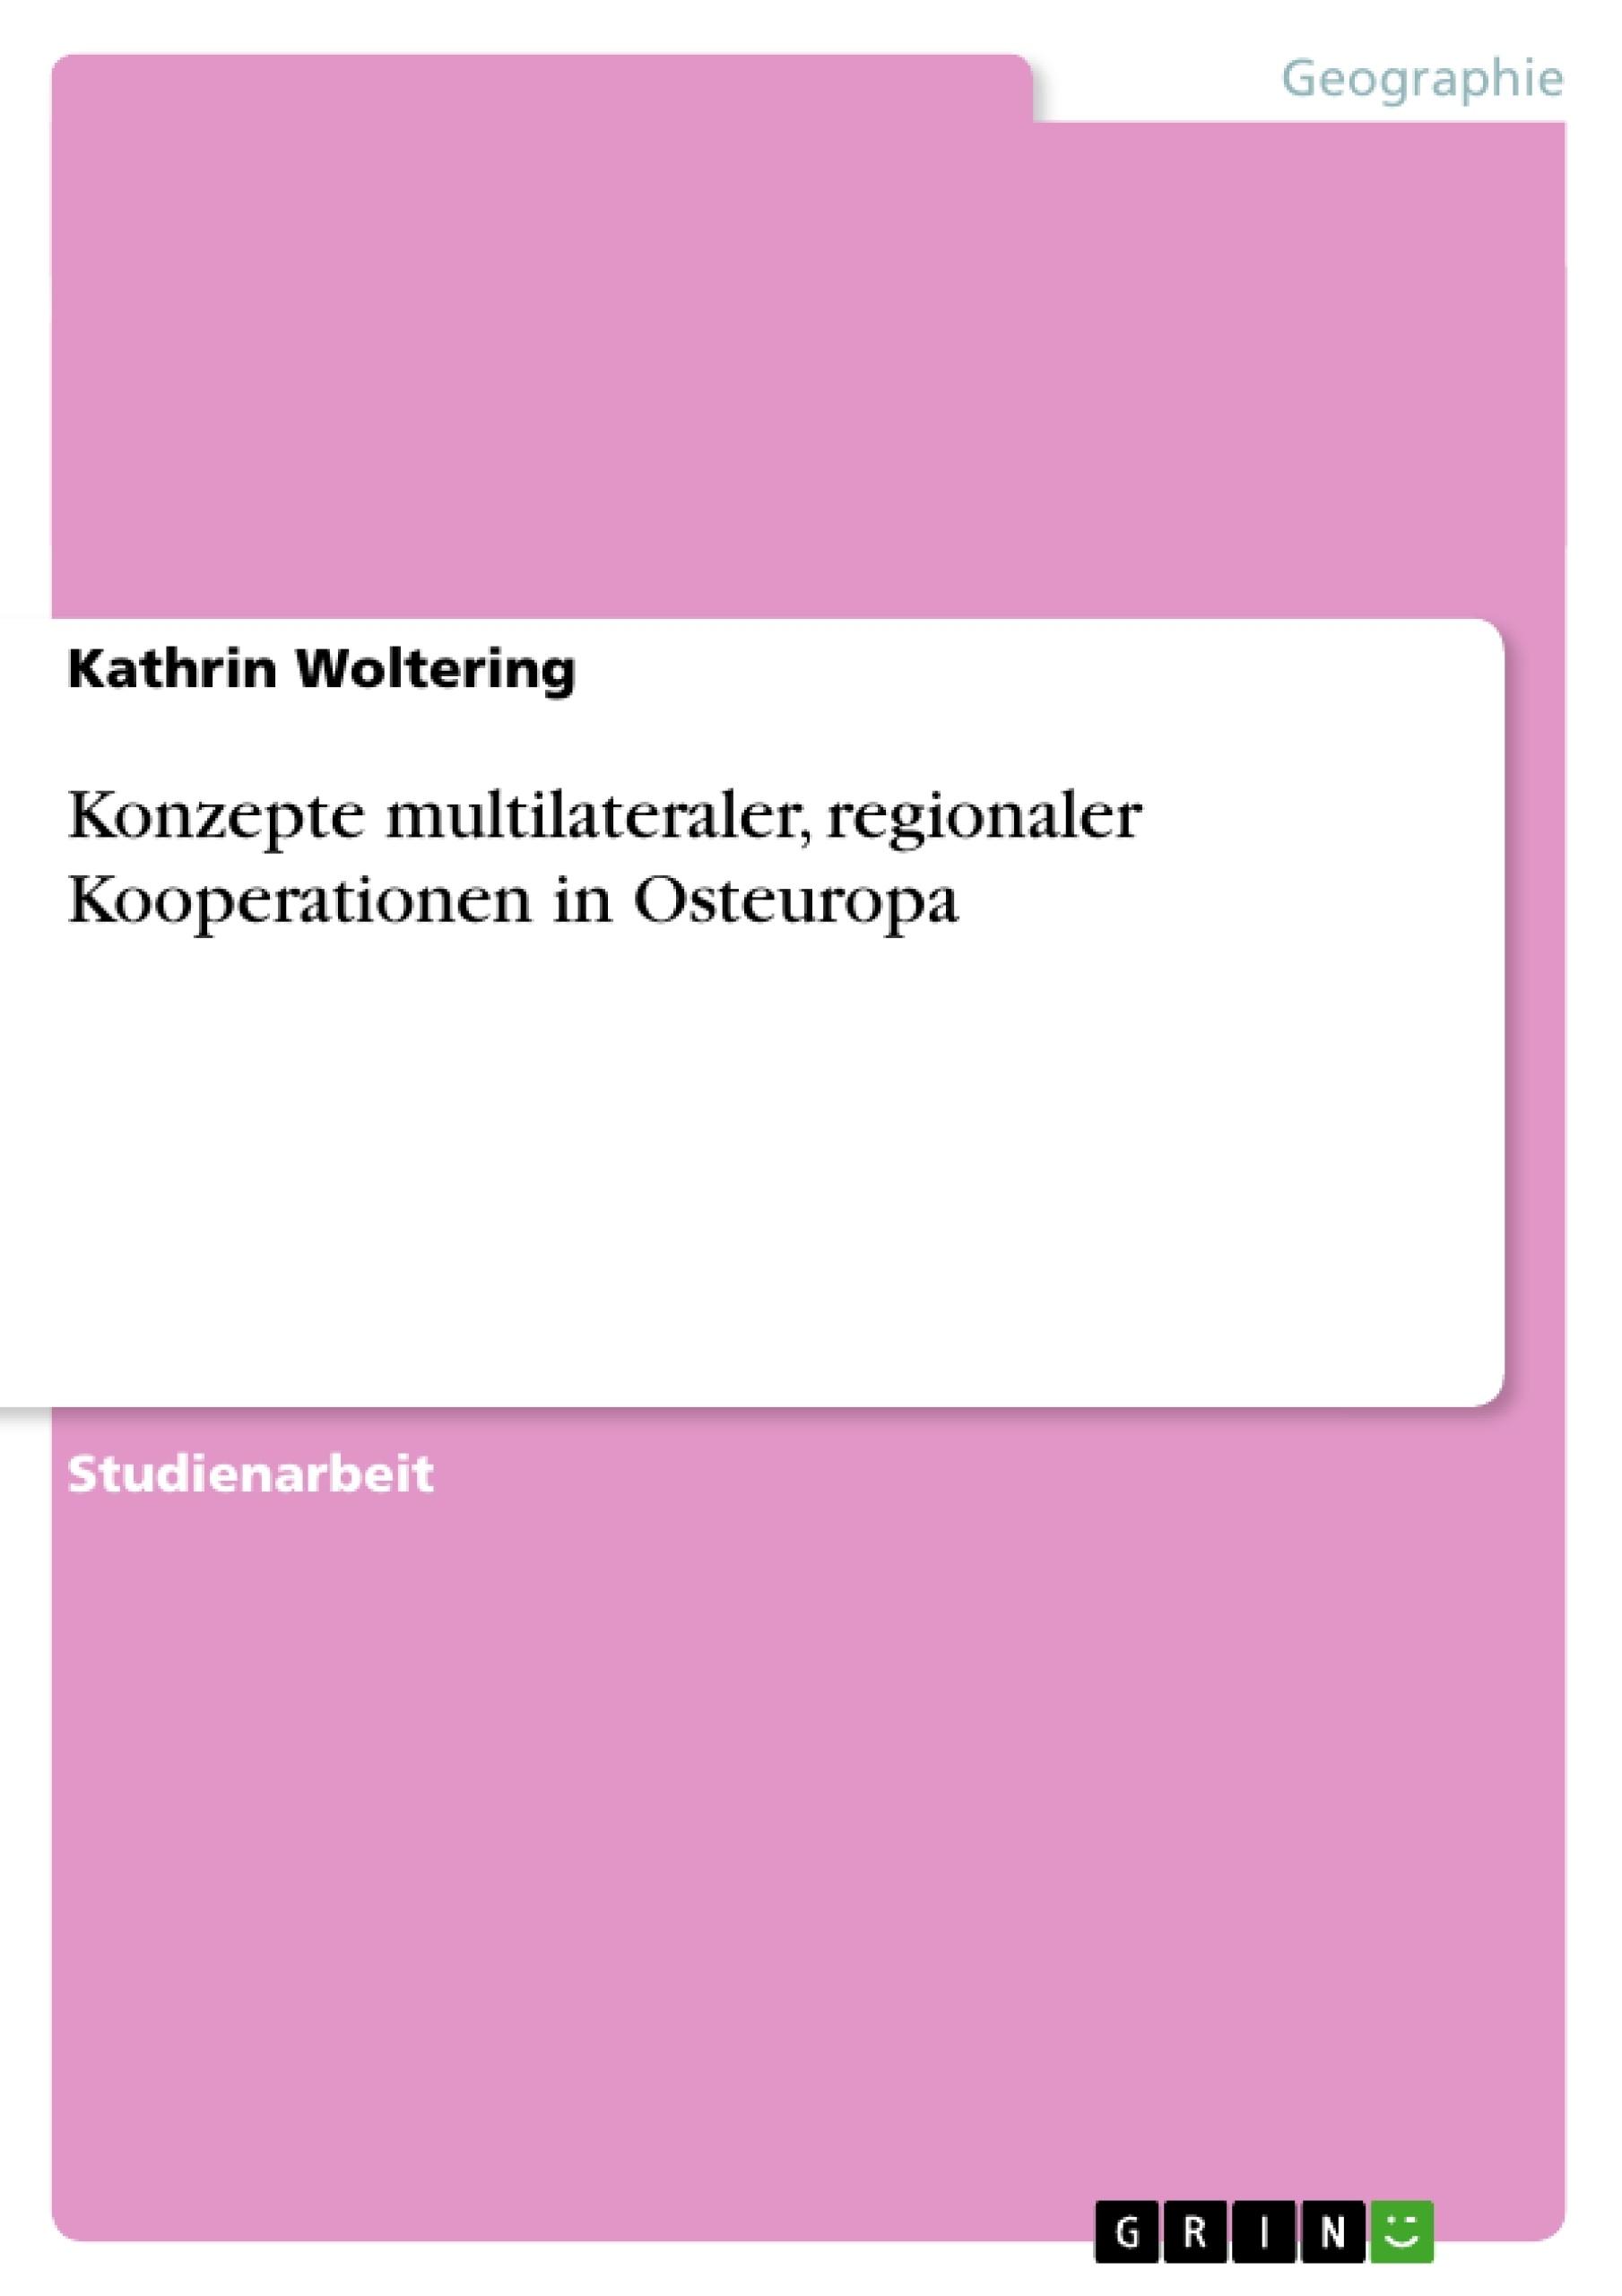 Titel: Konzepte multilateraler, regionaler Kooperationen in Osteuropa